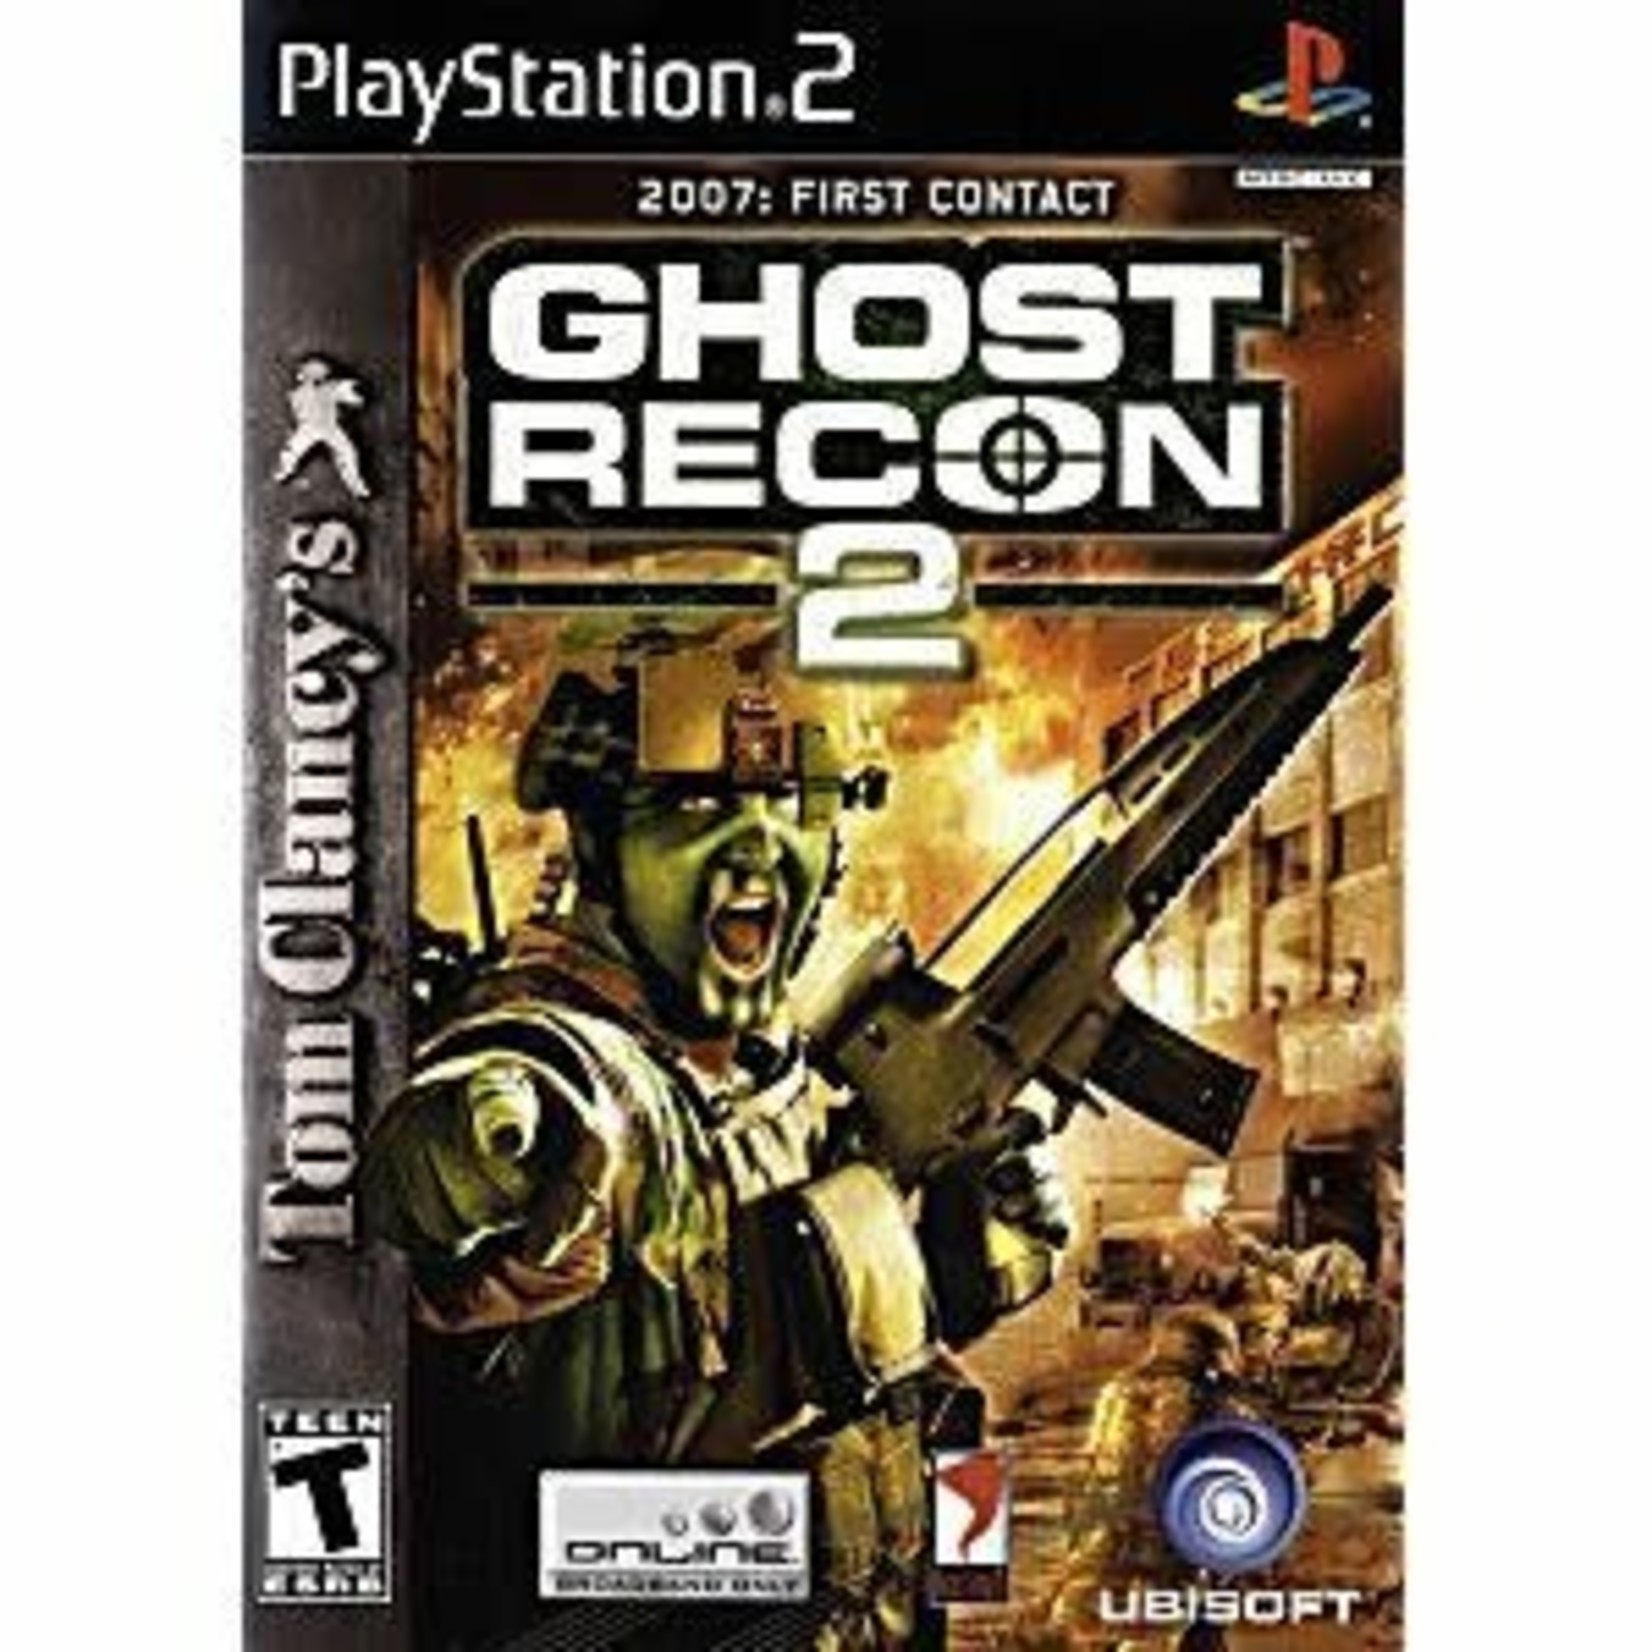 PS2U-GHOST RECON 2